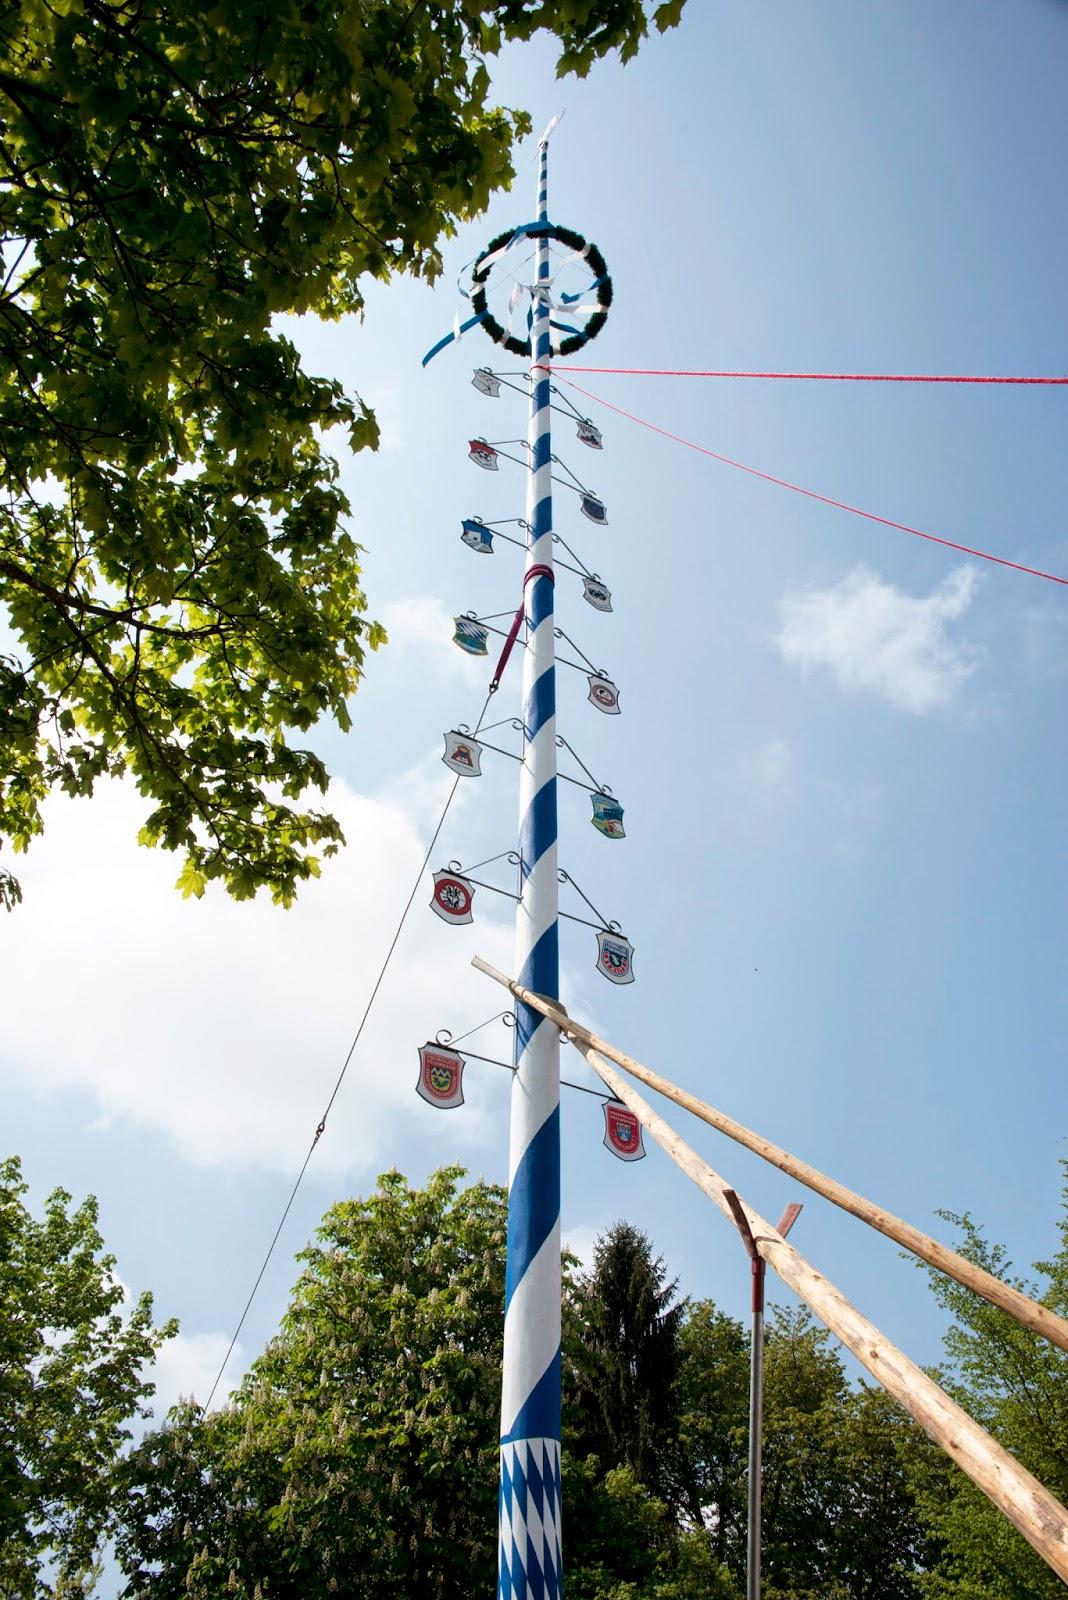 Raising the Maypole (Maibaum) in Bavaria near Munich